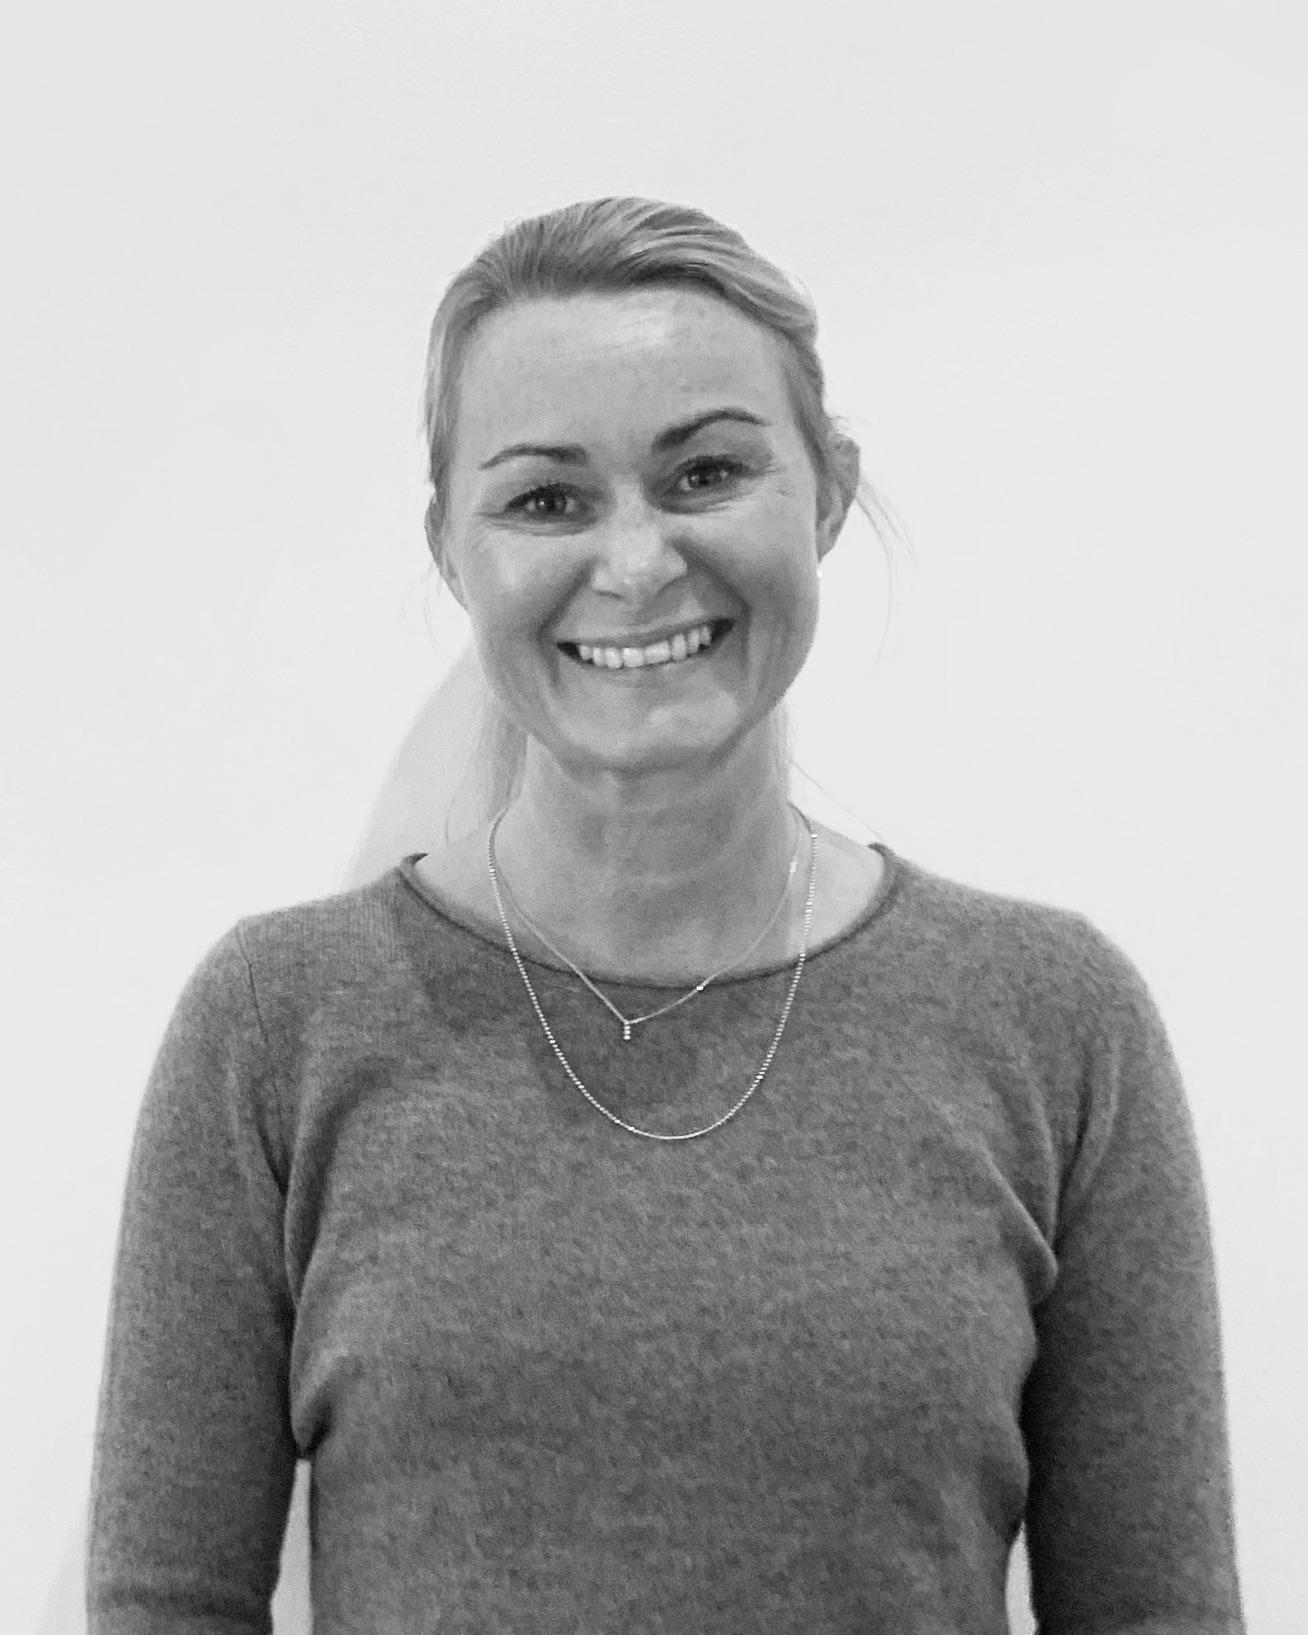 Else Marie Fiil Hyldgaard hos Tandlægerne Classensgade